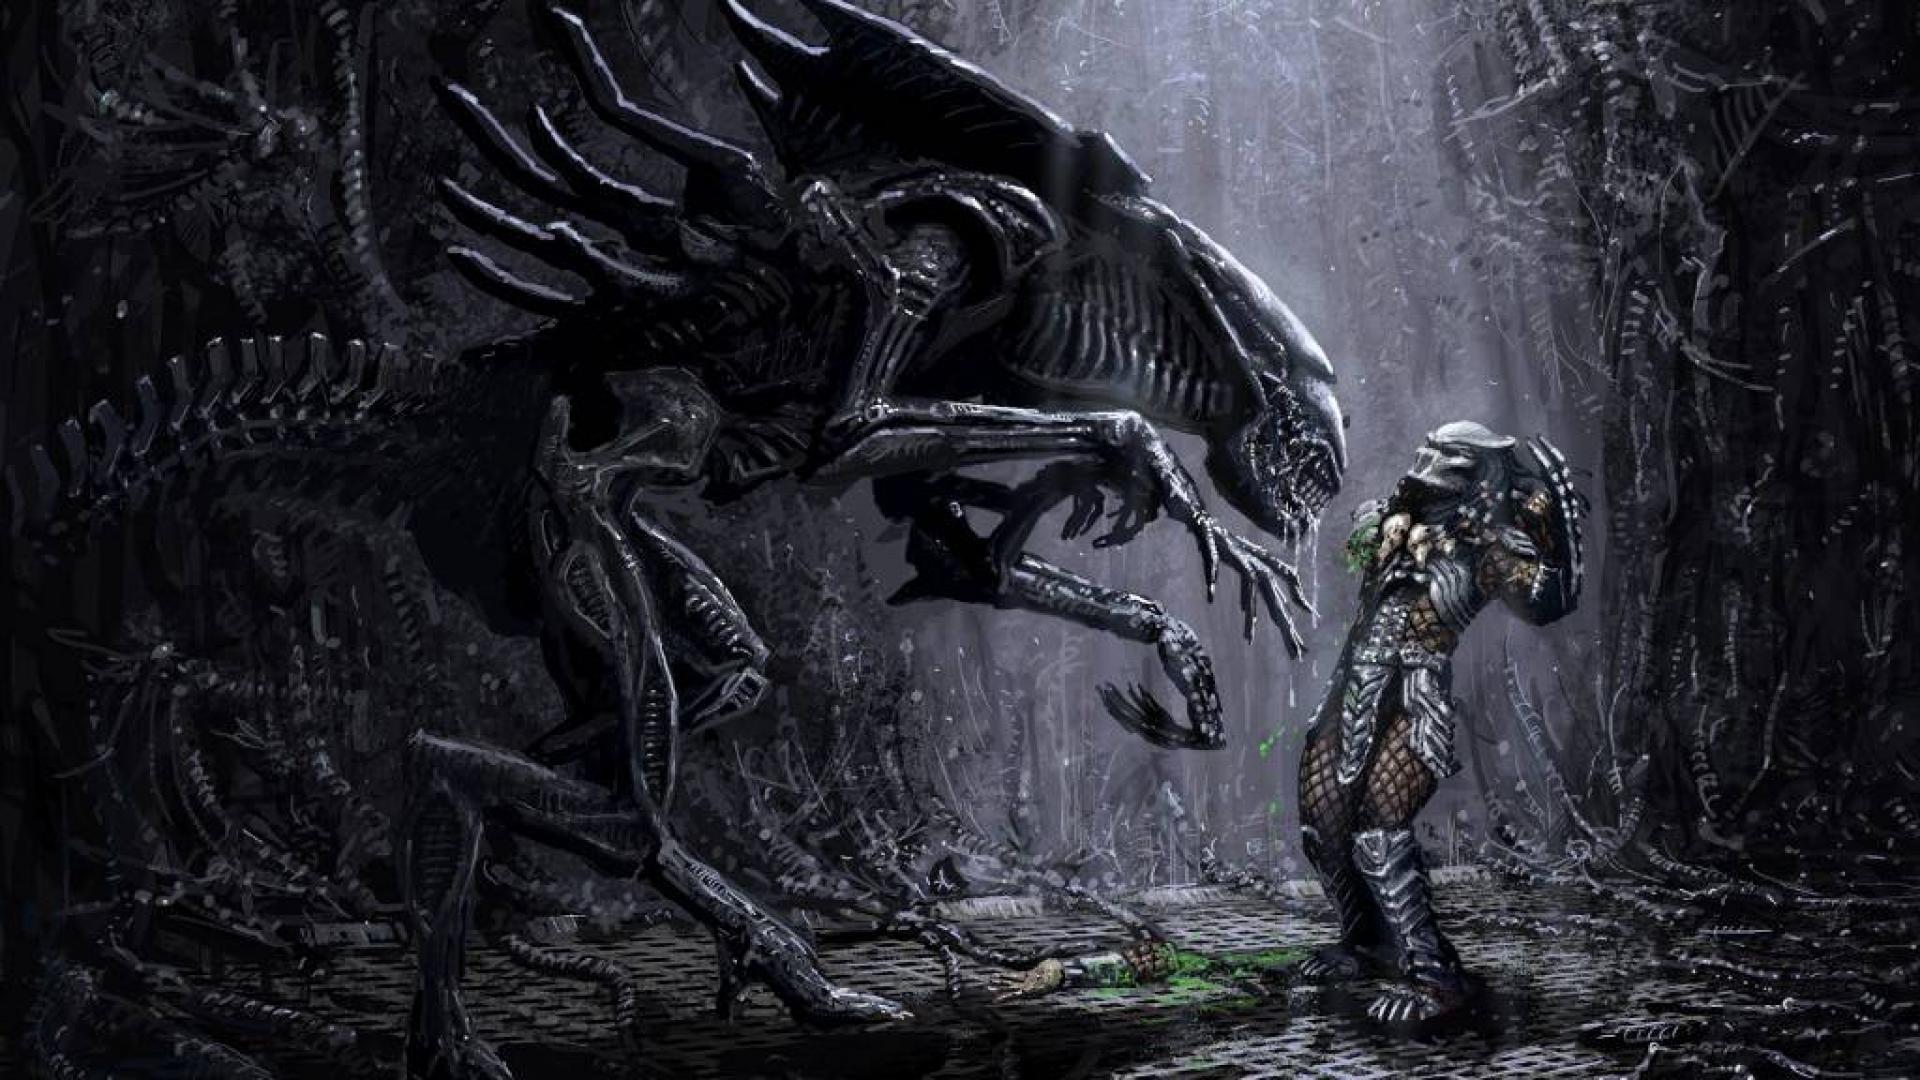 Alien Vs Predator Hd Wallpapers: Alien Vs Predator Wallpaper (80+ Images